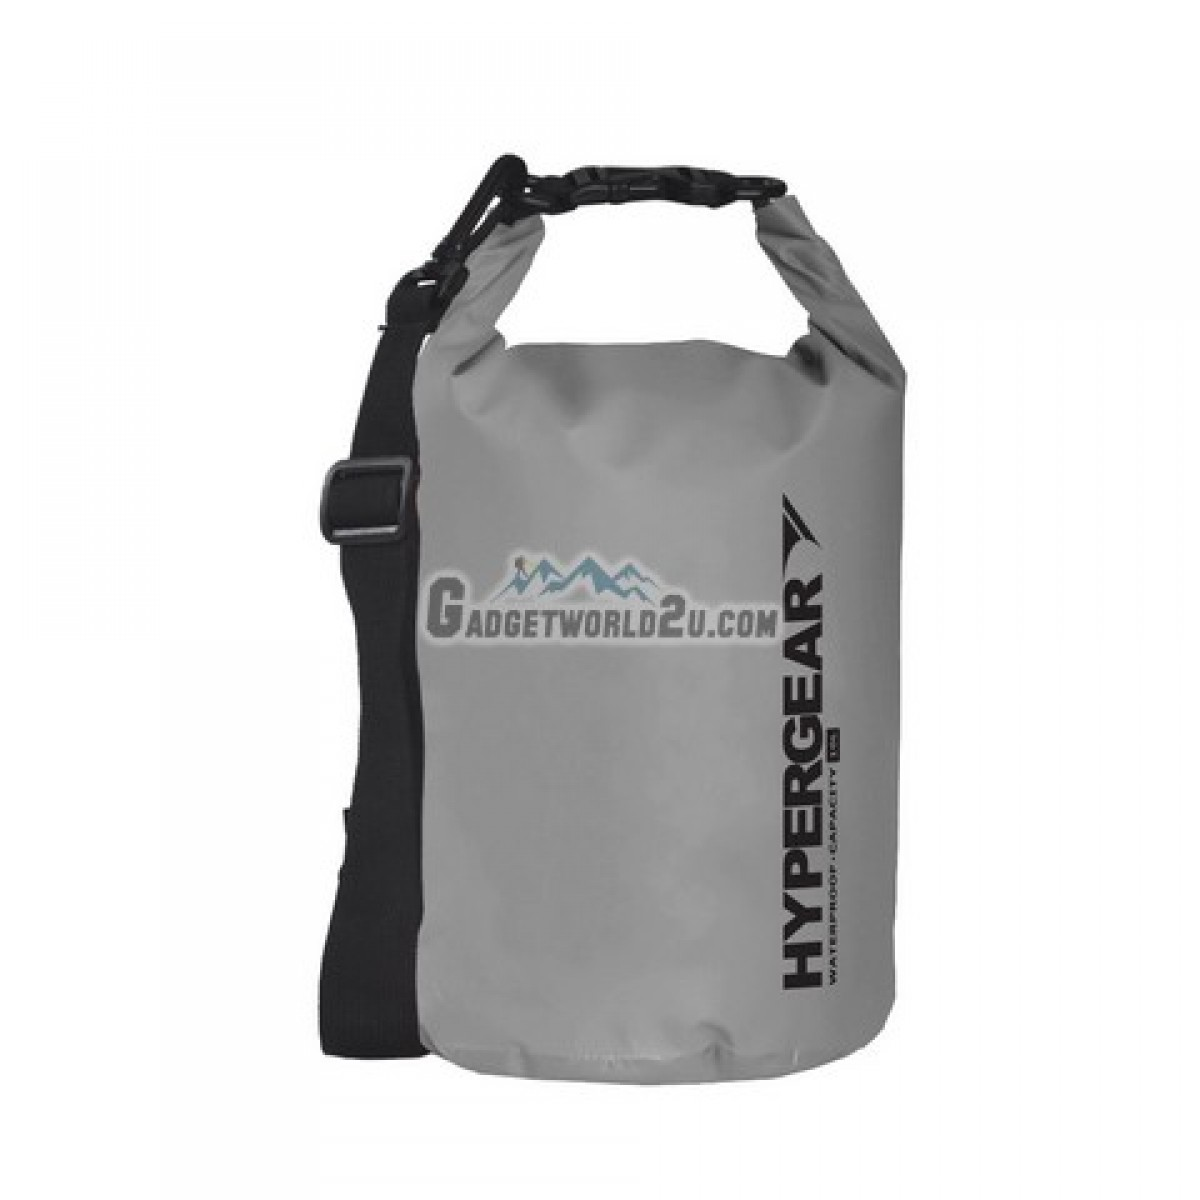 Hypergear Adventure Dry Bag Water Resistant 10 Liter - Grey